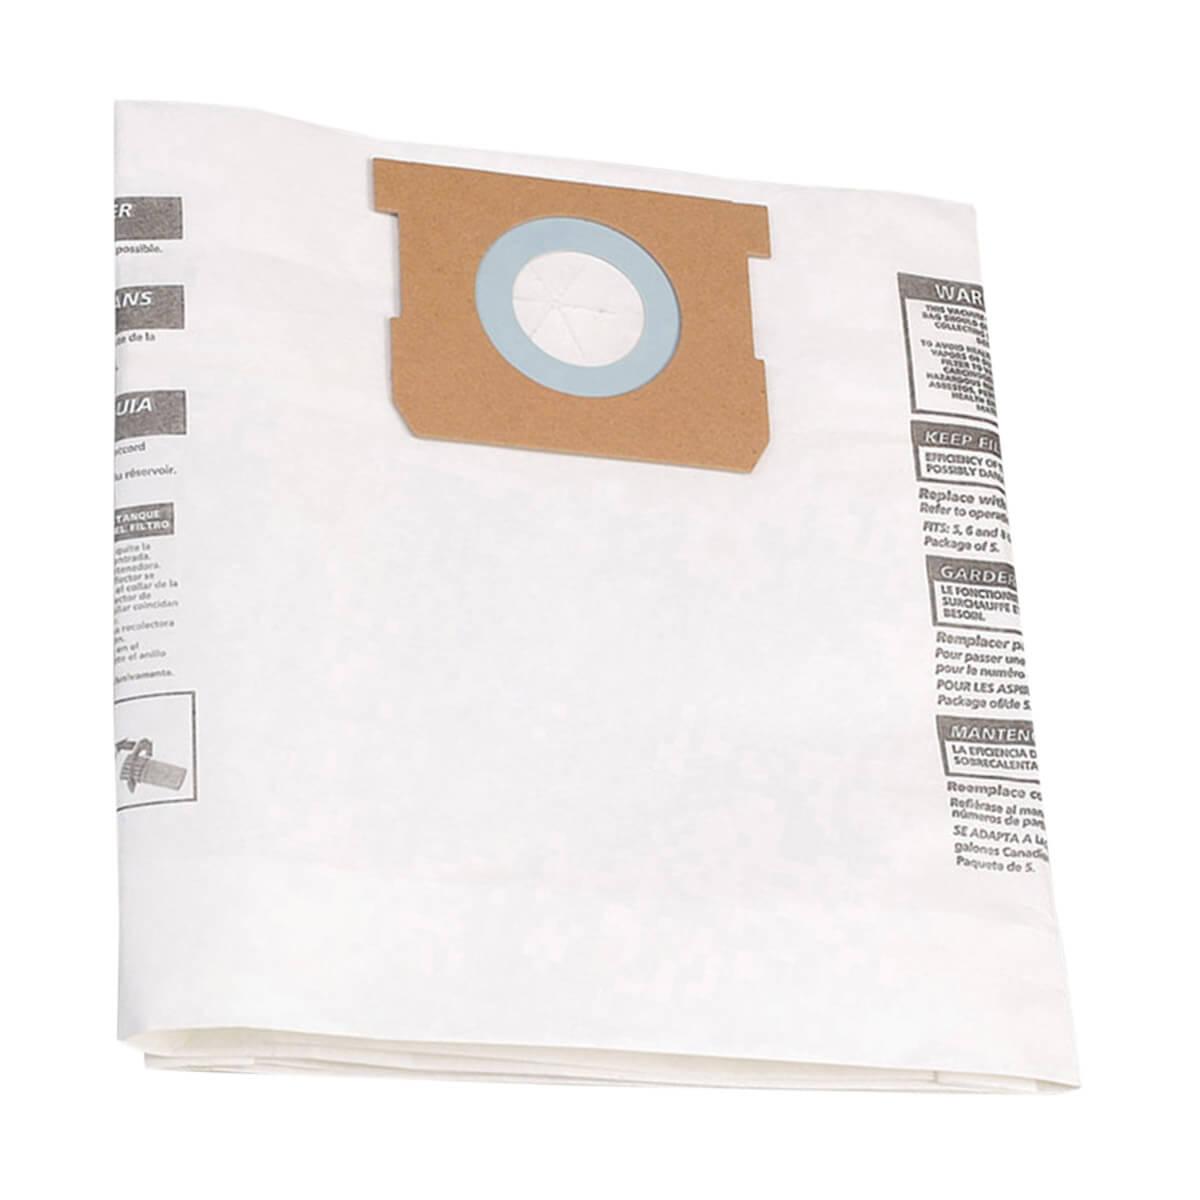 SHOP-VAC® Type E (18.9-30.3 Litre) Filter Bags (3 Pack)